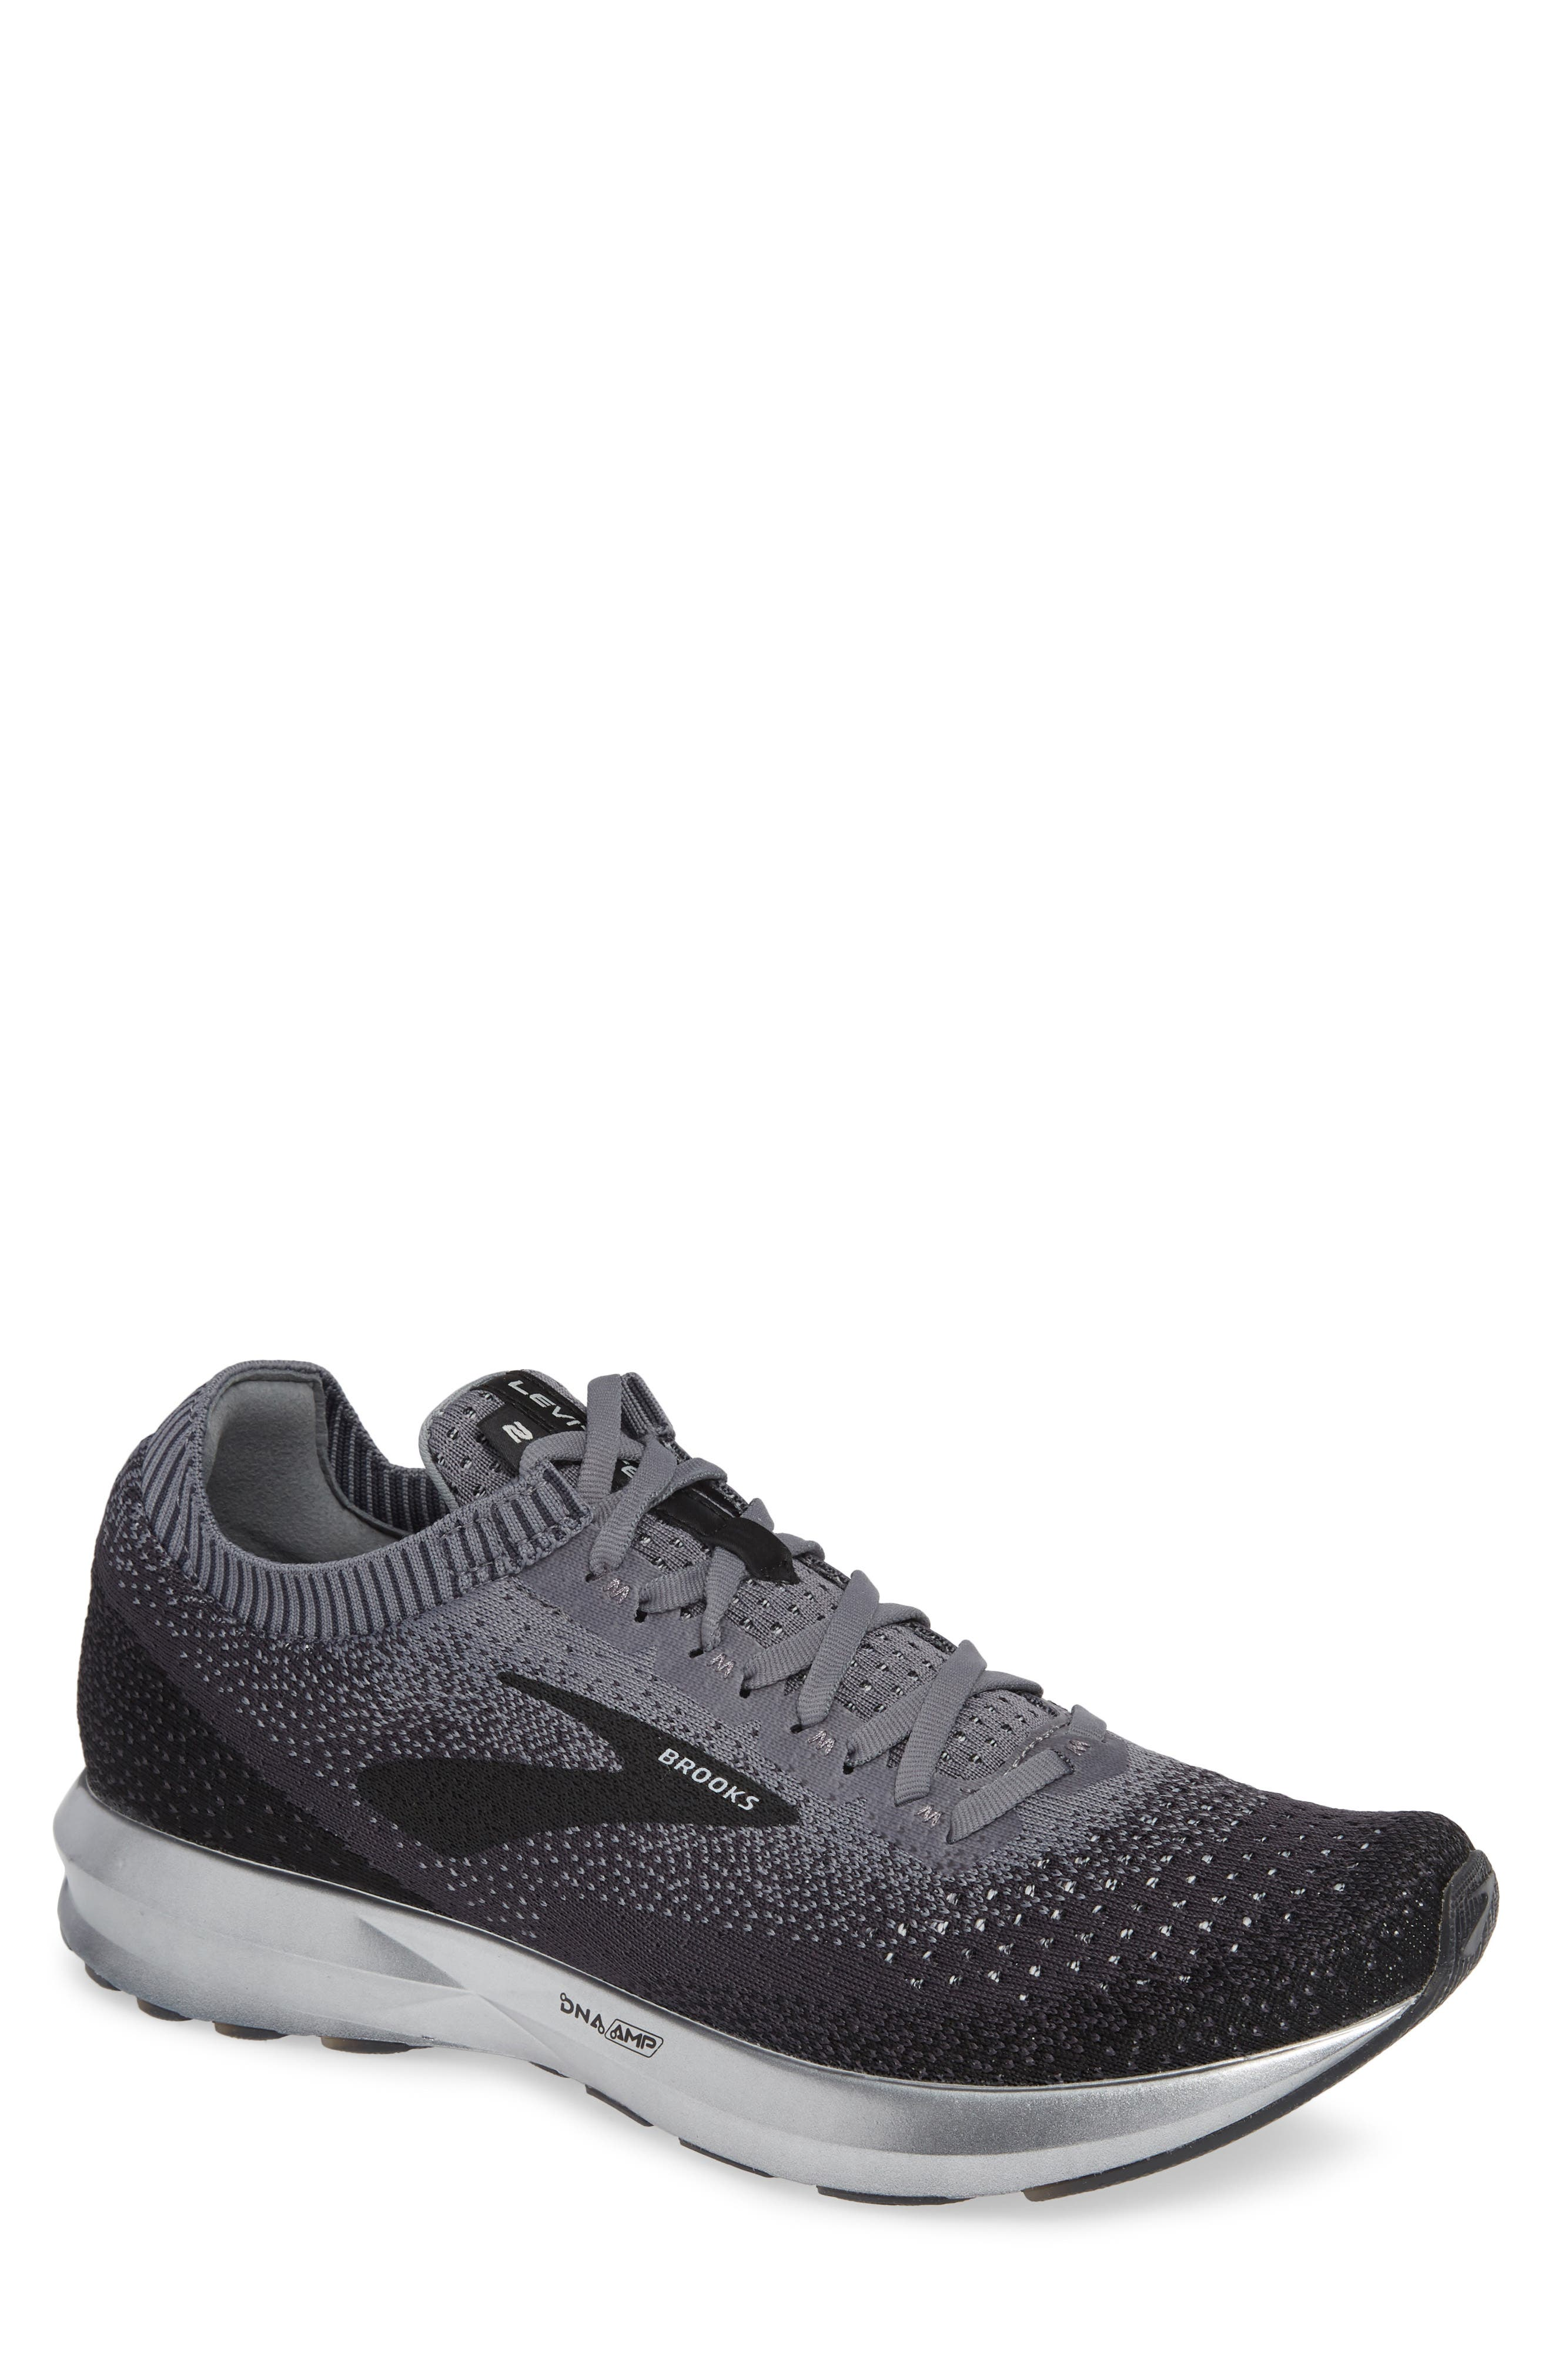 Levitate 2 Running Shoe, Main, color, BLACK/ GREY/ EBONY